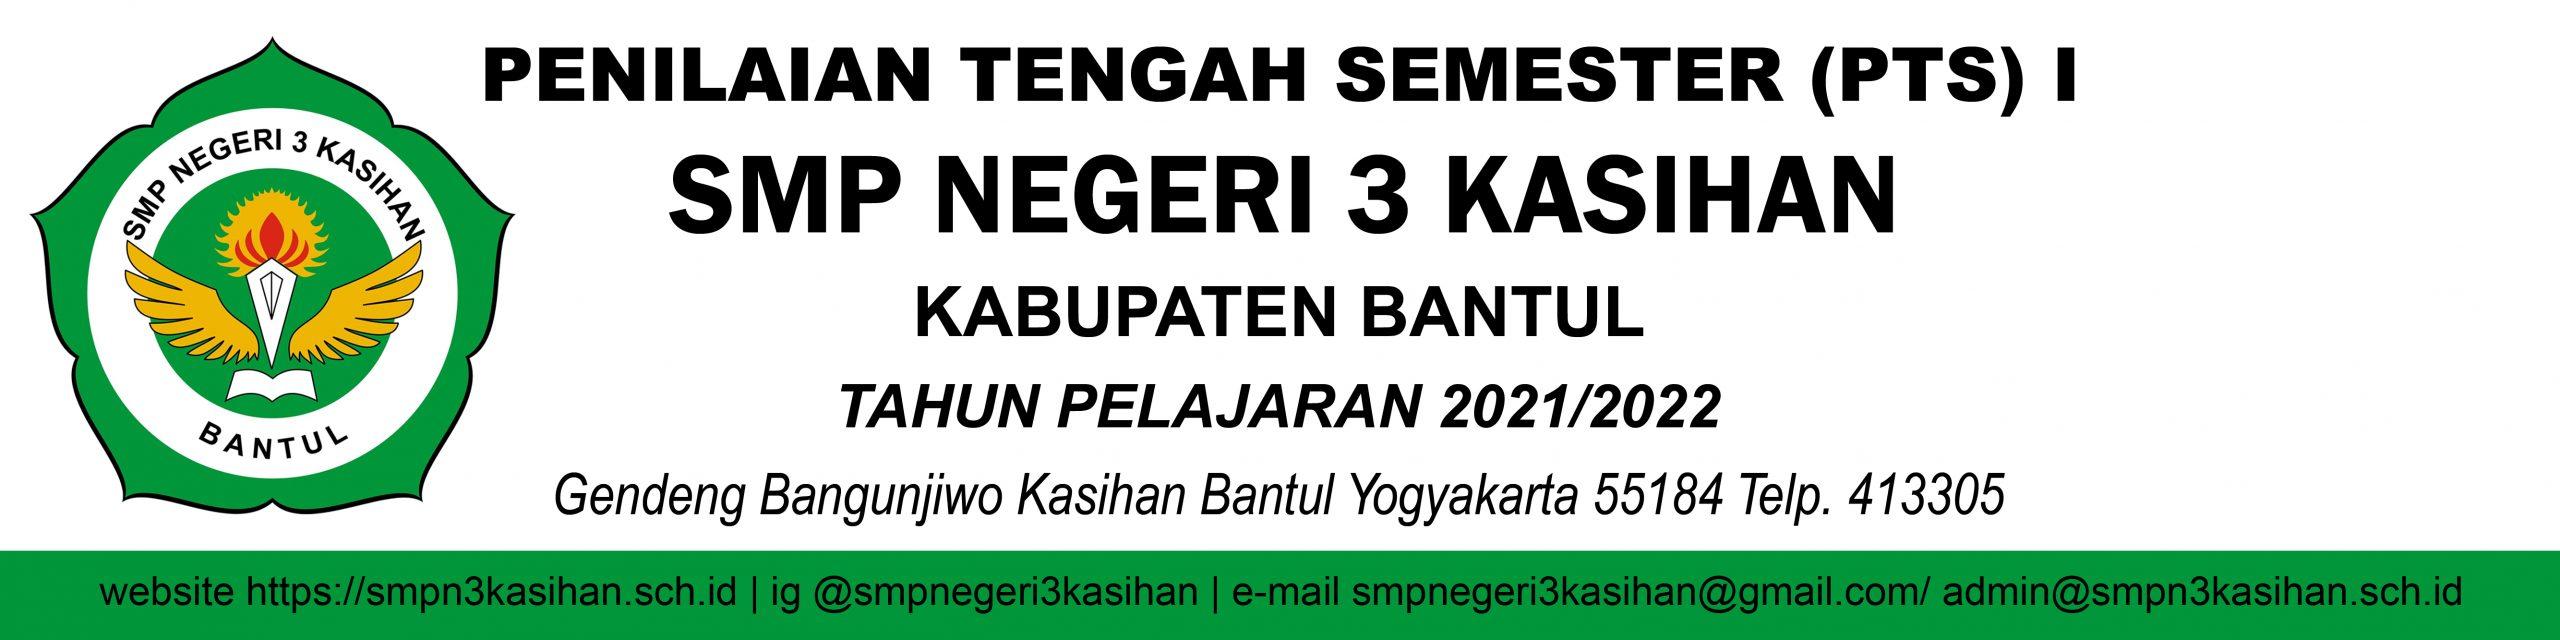 Jadwal dan Pelaksanaan PTS 1 2021/2022